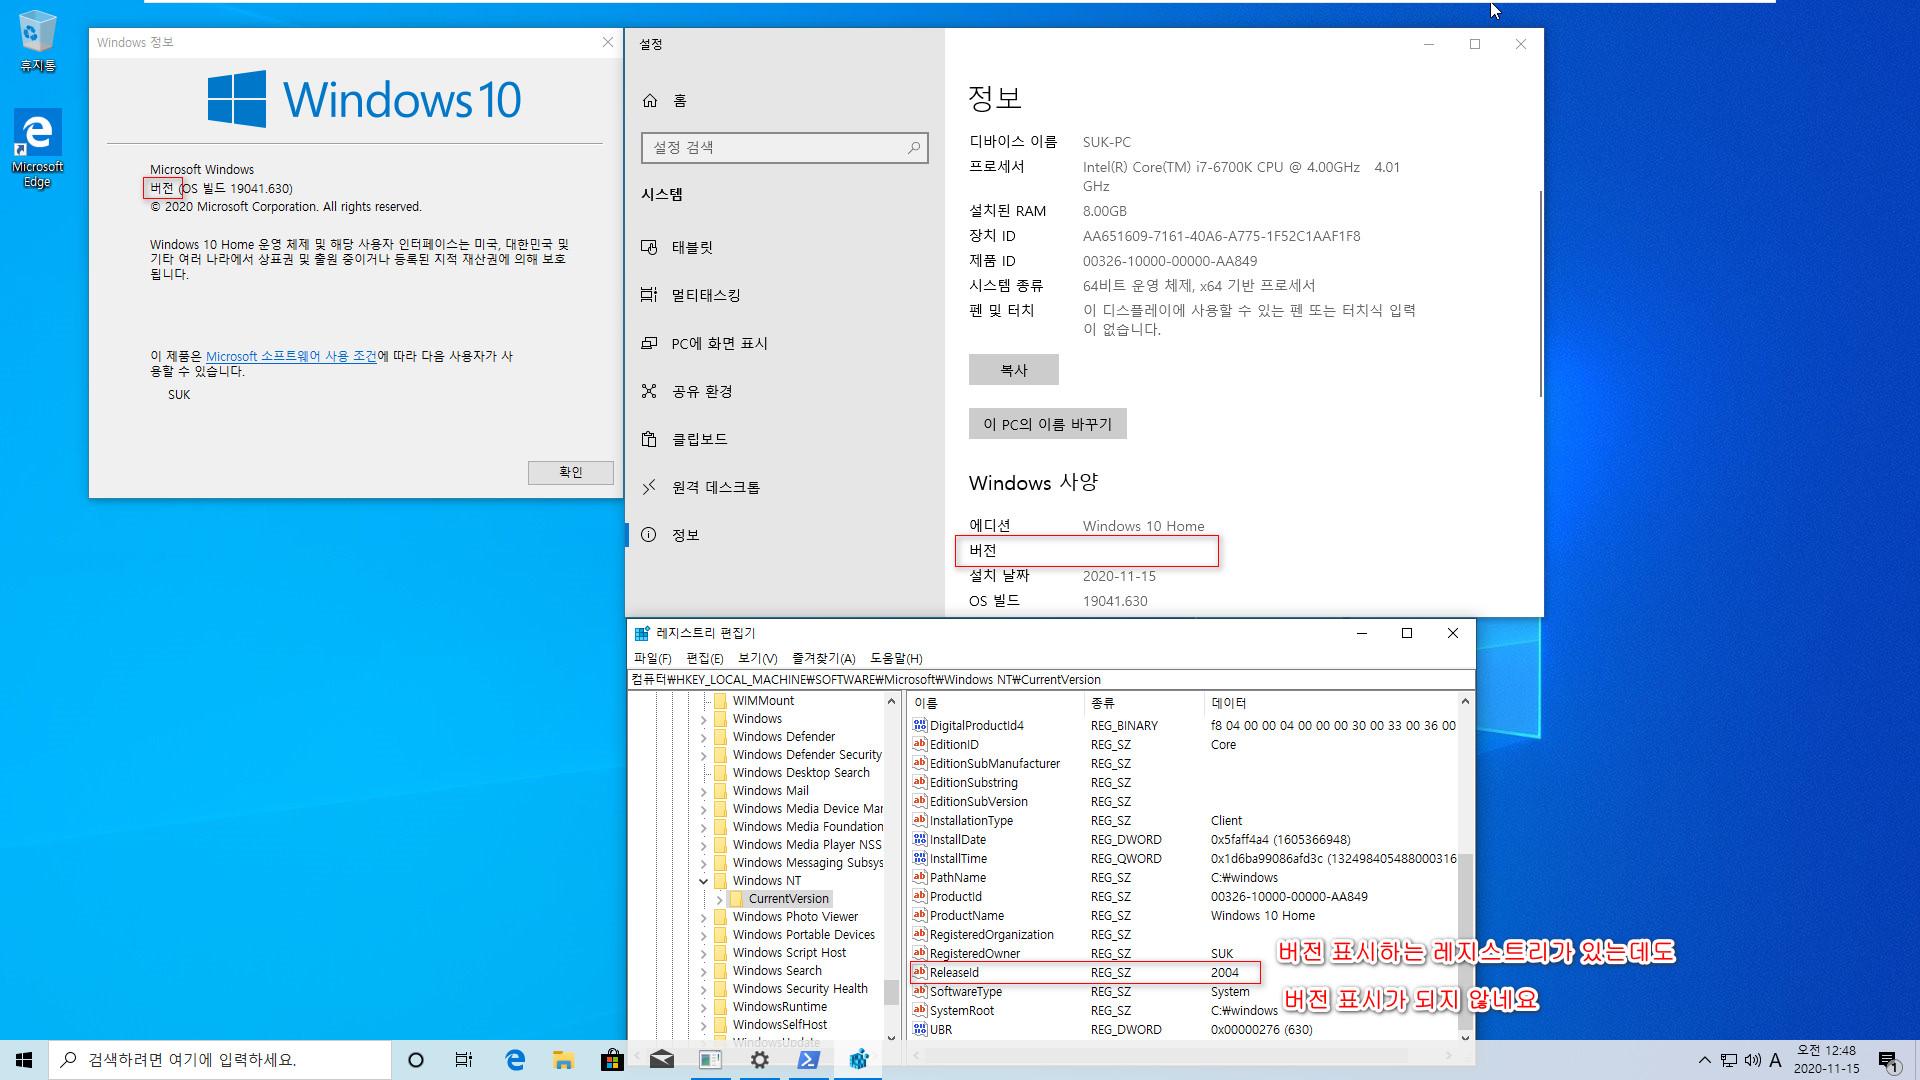 Windows 10 버전이 표시 되어 있지 않을 때, 버전 표시하기.bat 테스트 - Windows 10 버전 2004 윈도우 중에 버전이 표시되지 않는 윈도우가 있어서 만들게 됨 2020-11-15_004827.jpg